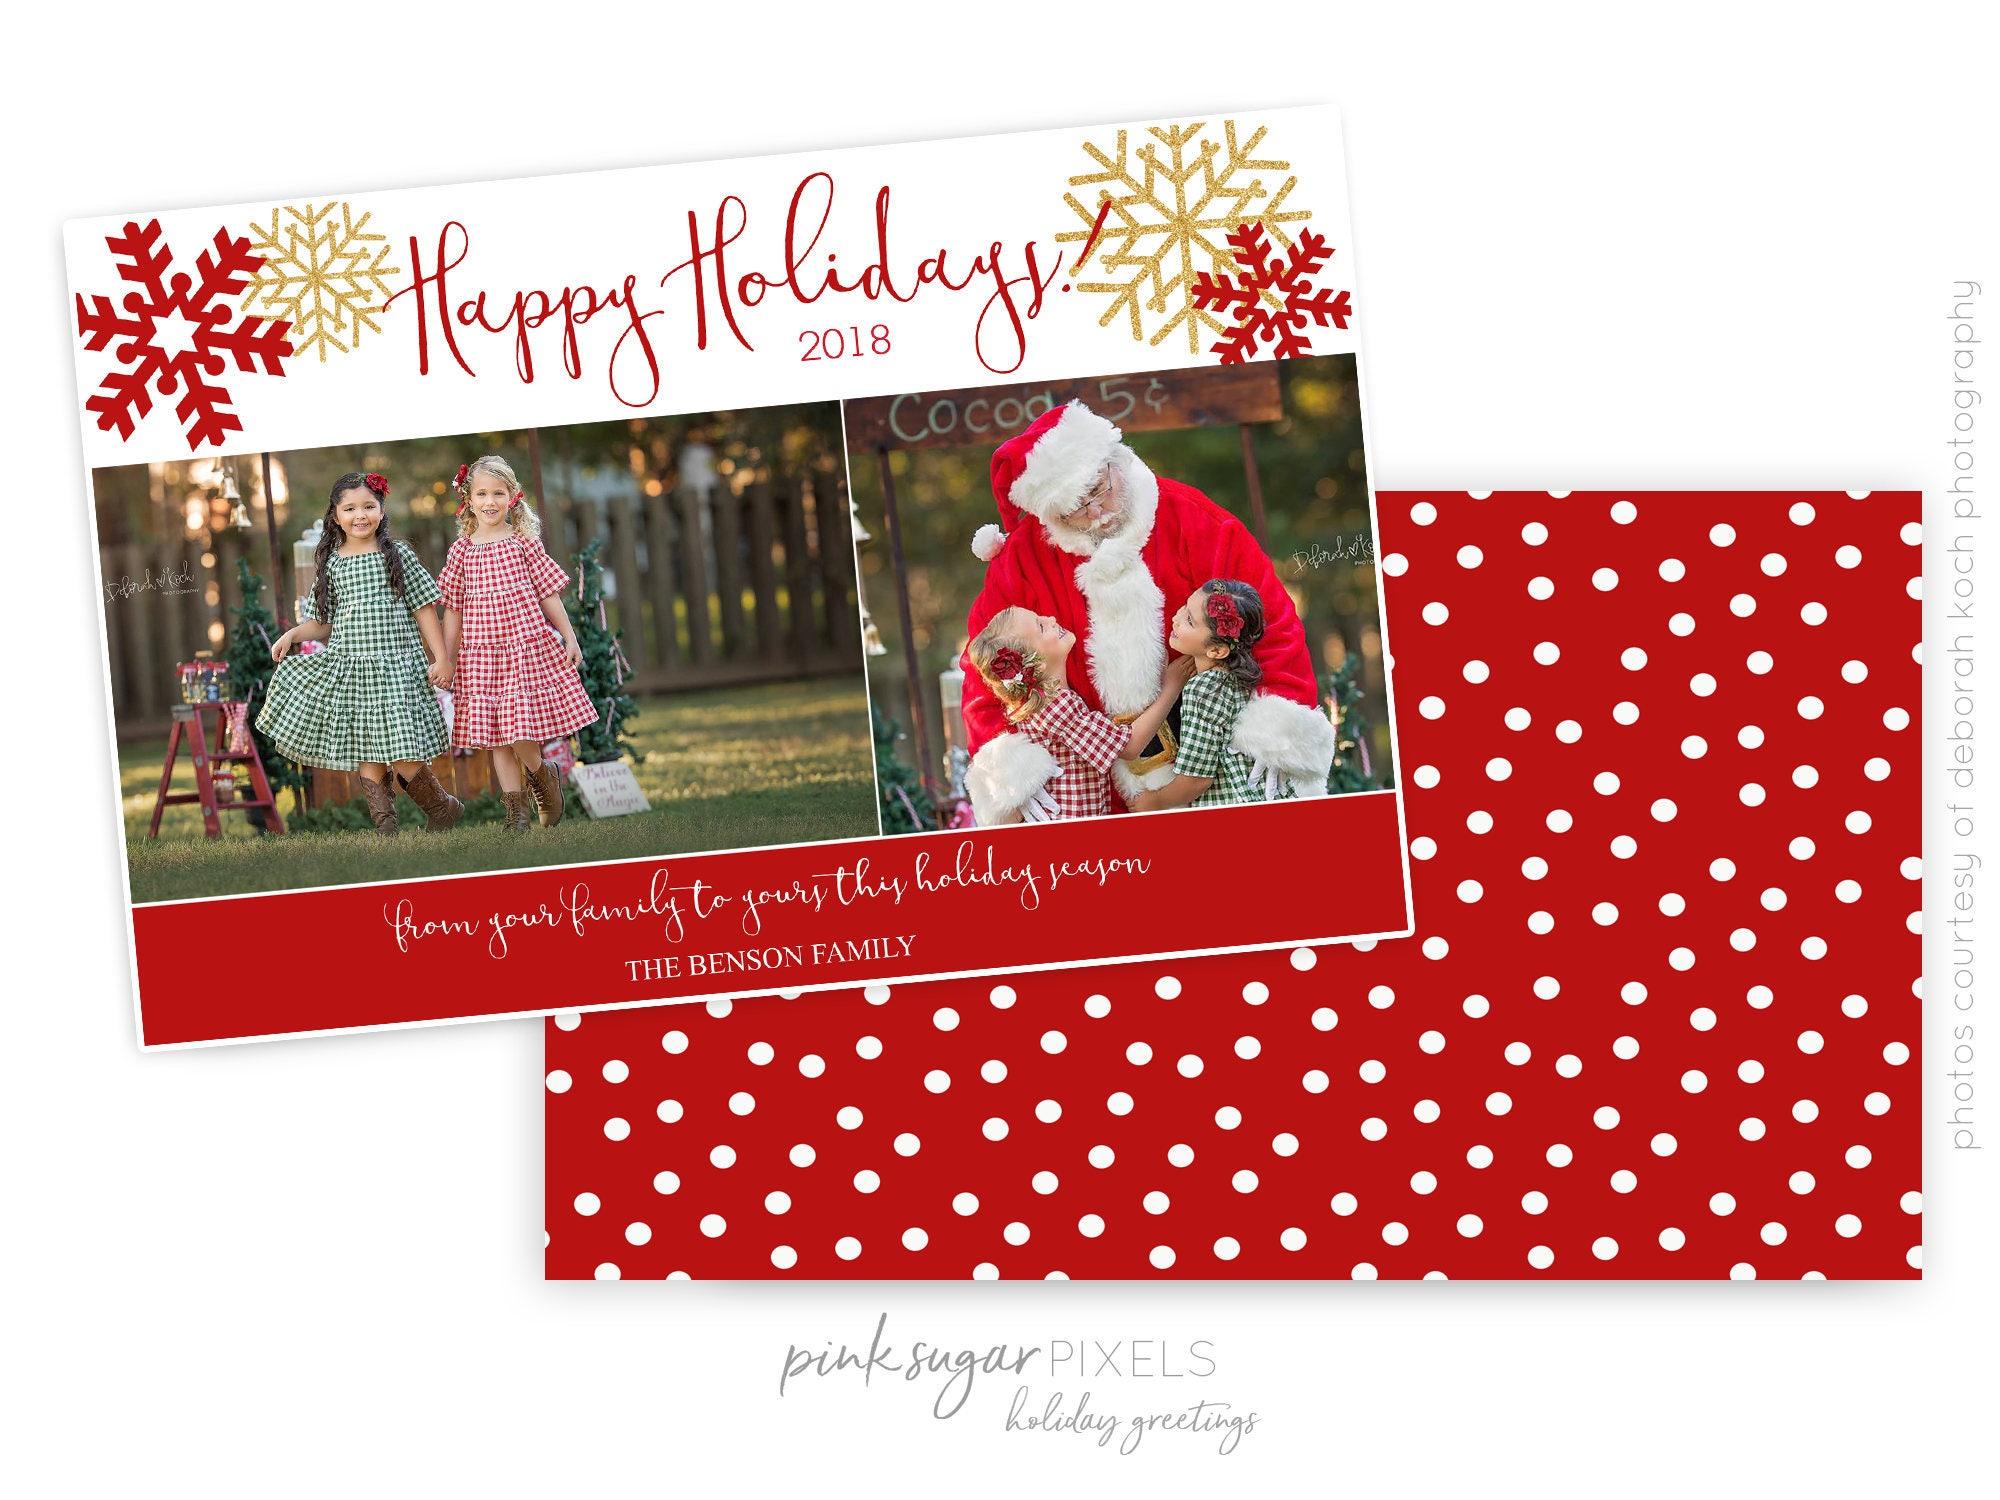 Christmas Cards Holiday Cards Custom Photo Christmas Cards | Etsy